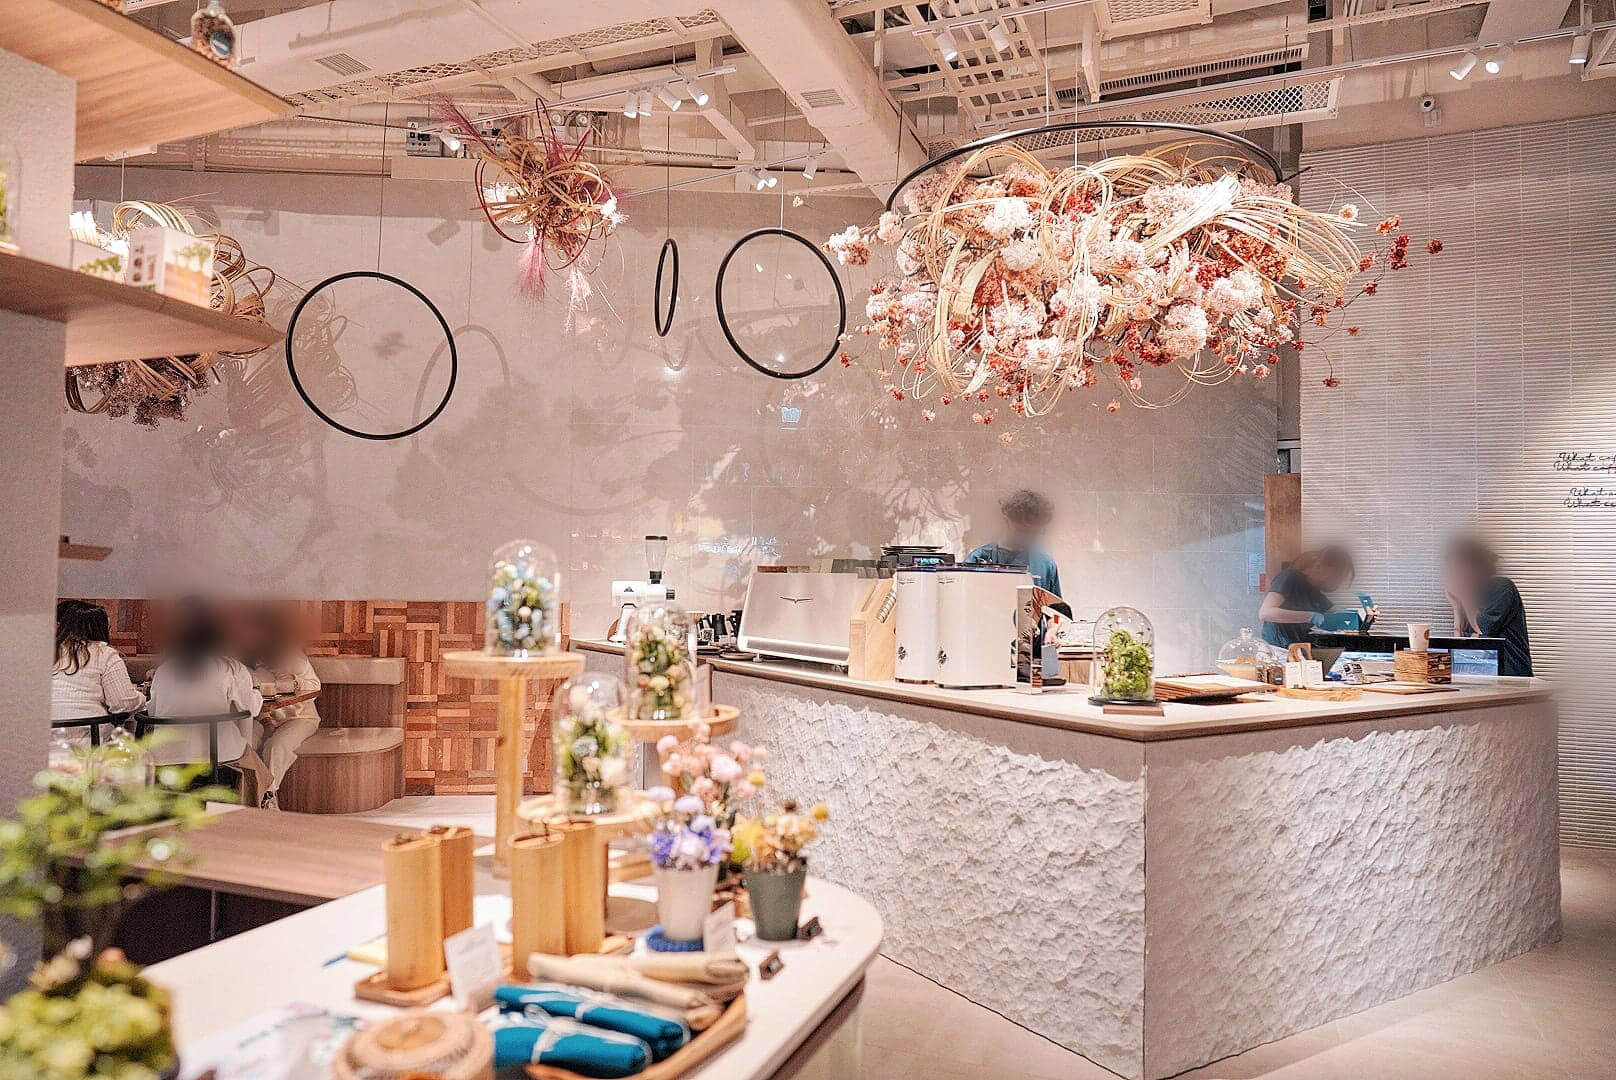 Cafe以櫻花為主題,另設小賣部供人買盆栽及訂花。